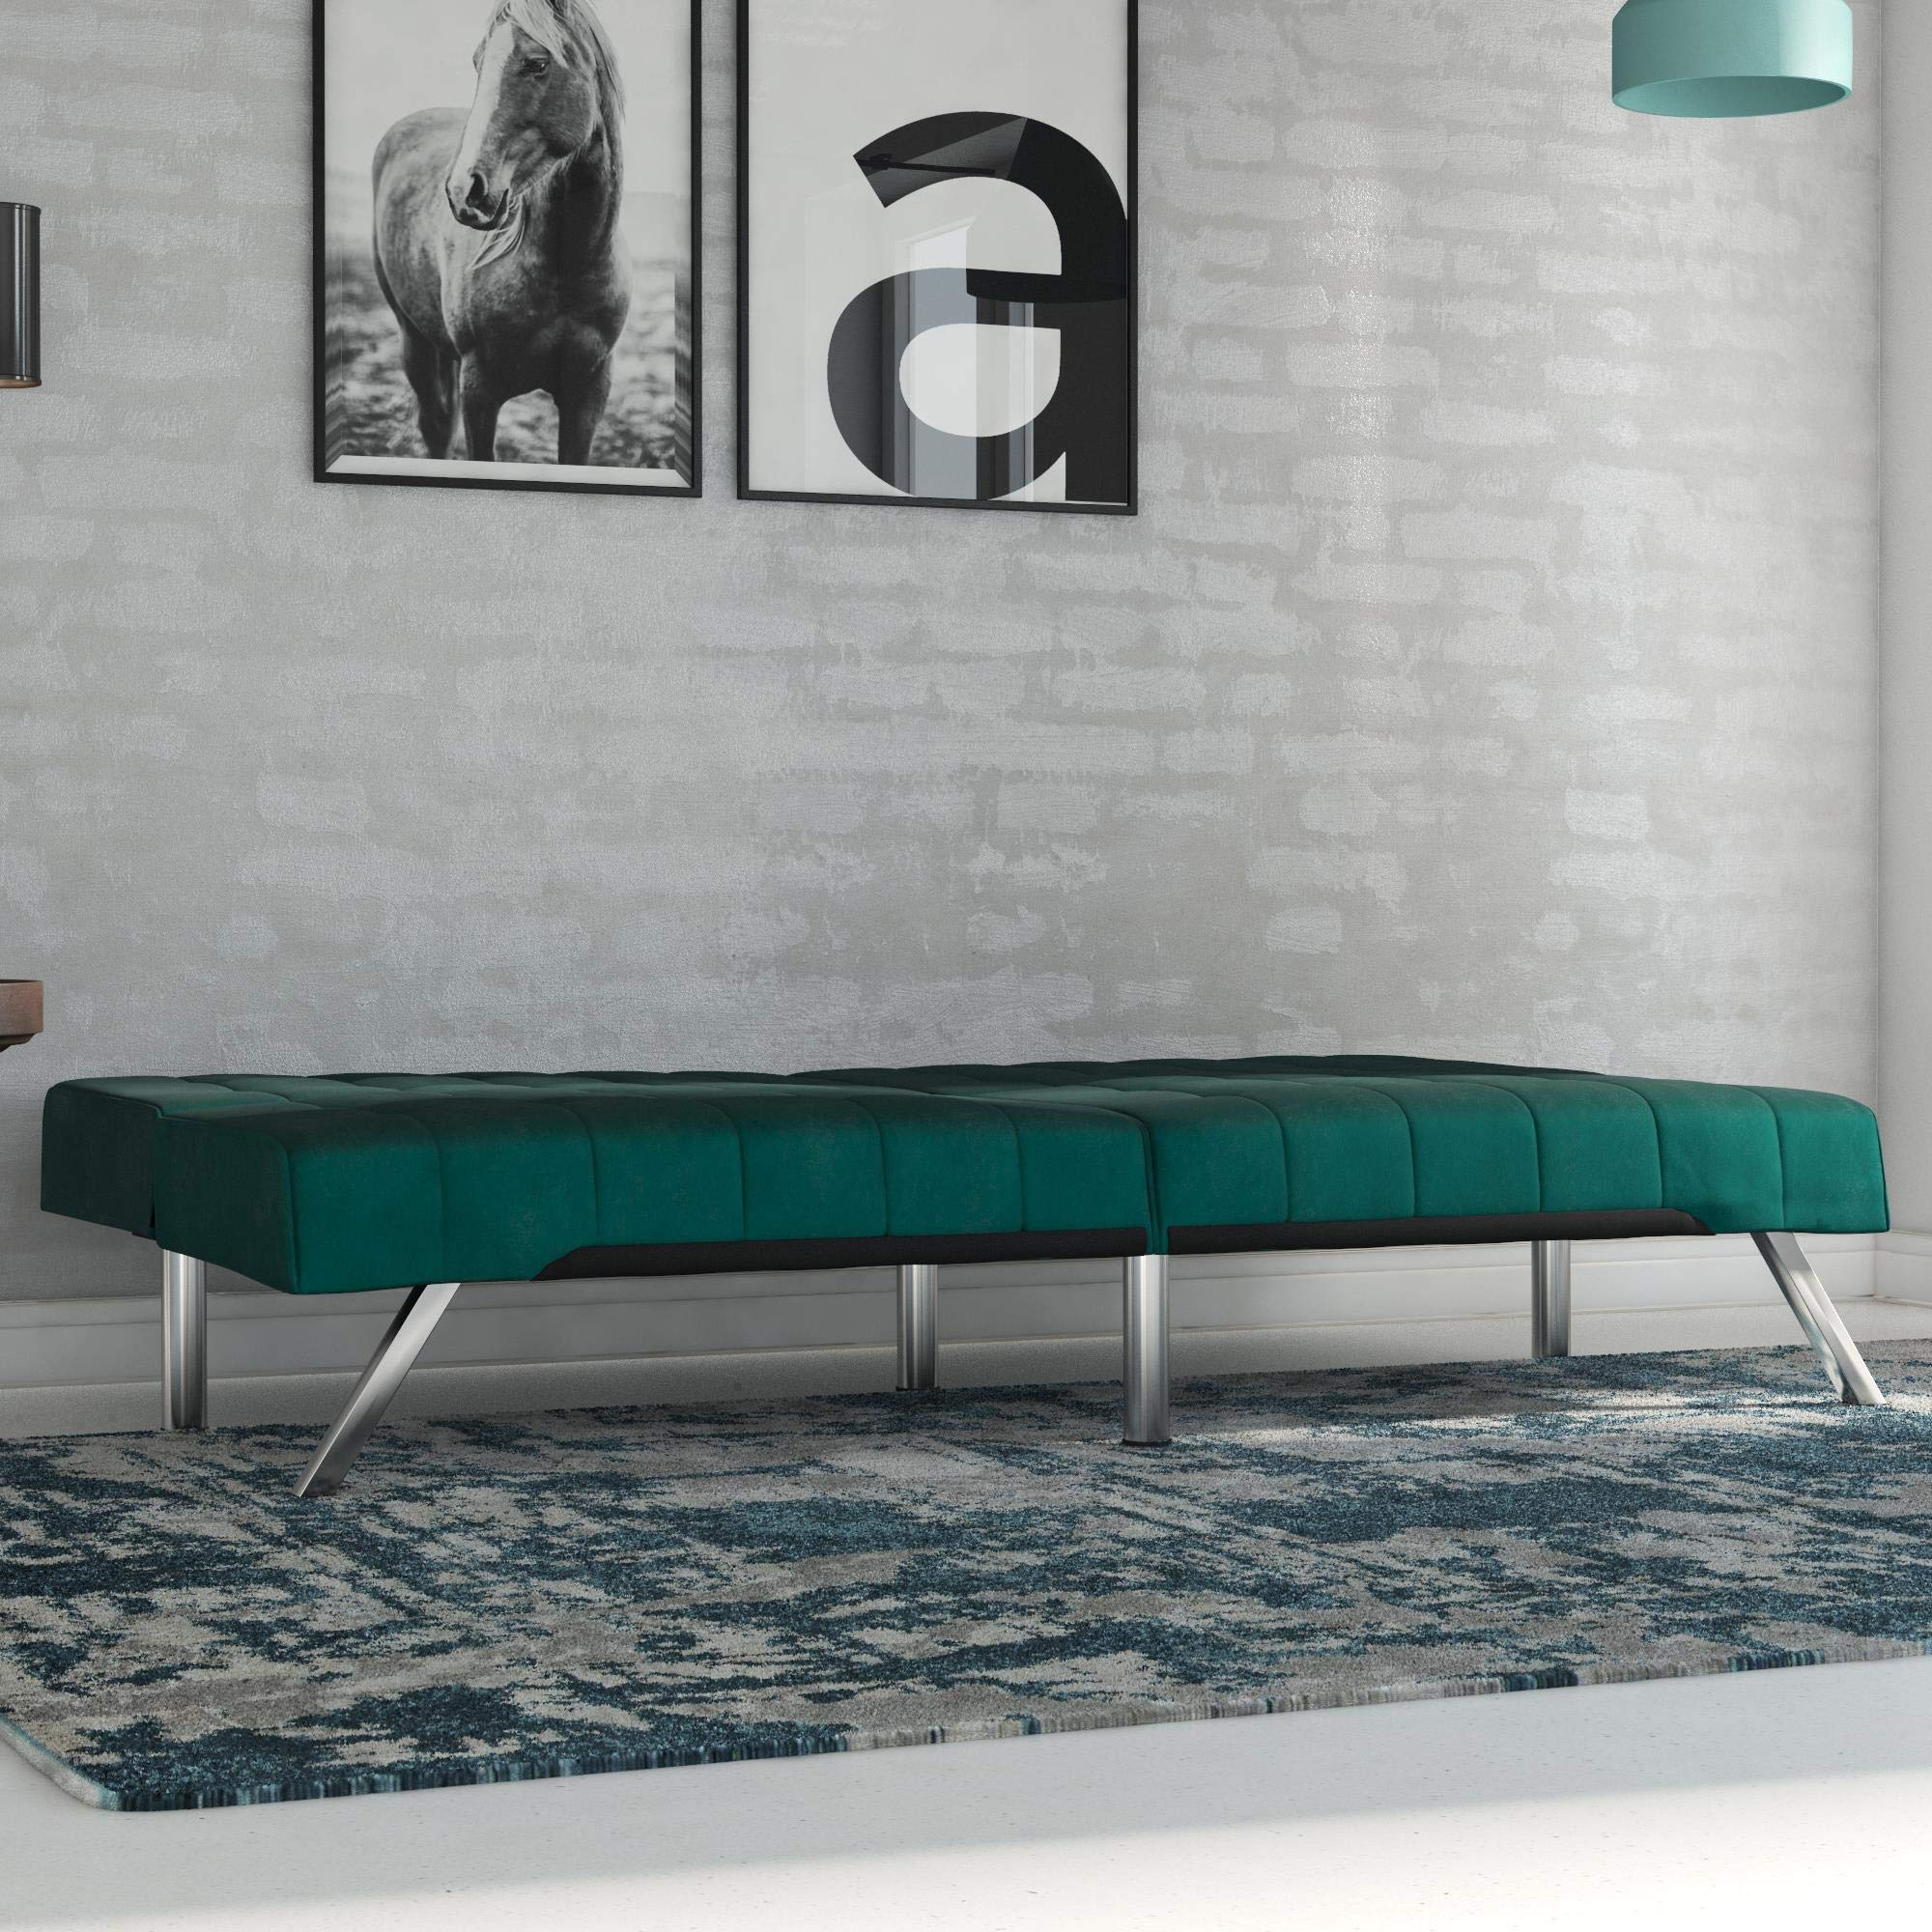 Surprising Dhp Emily Futon Sofa Bed Modern Couch Green Velvet Inzonedesignstudio Interior Chair Design Inzonedesignstudiocom